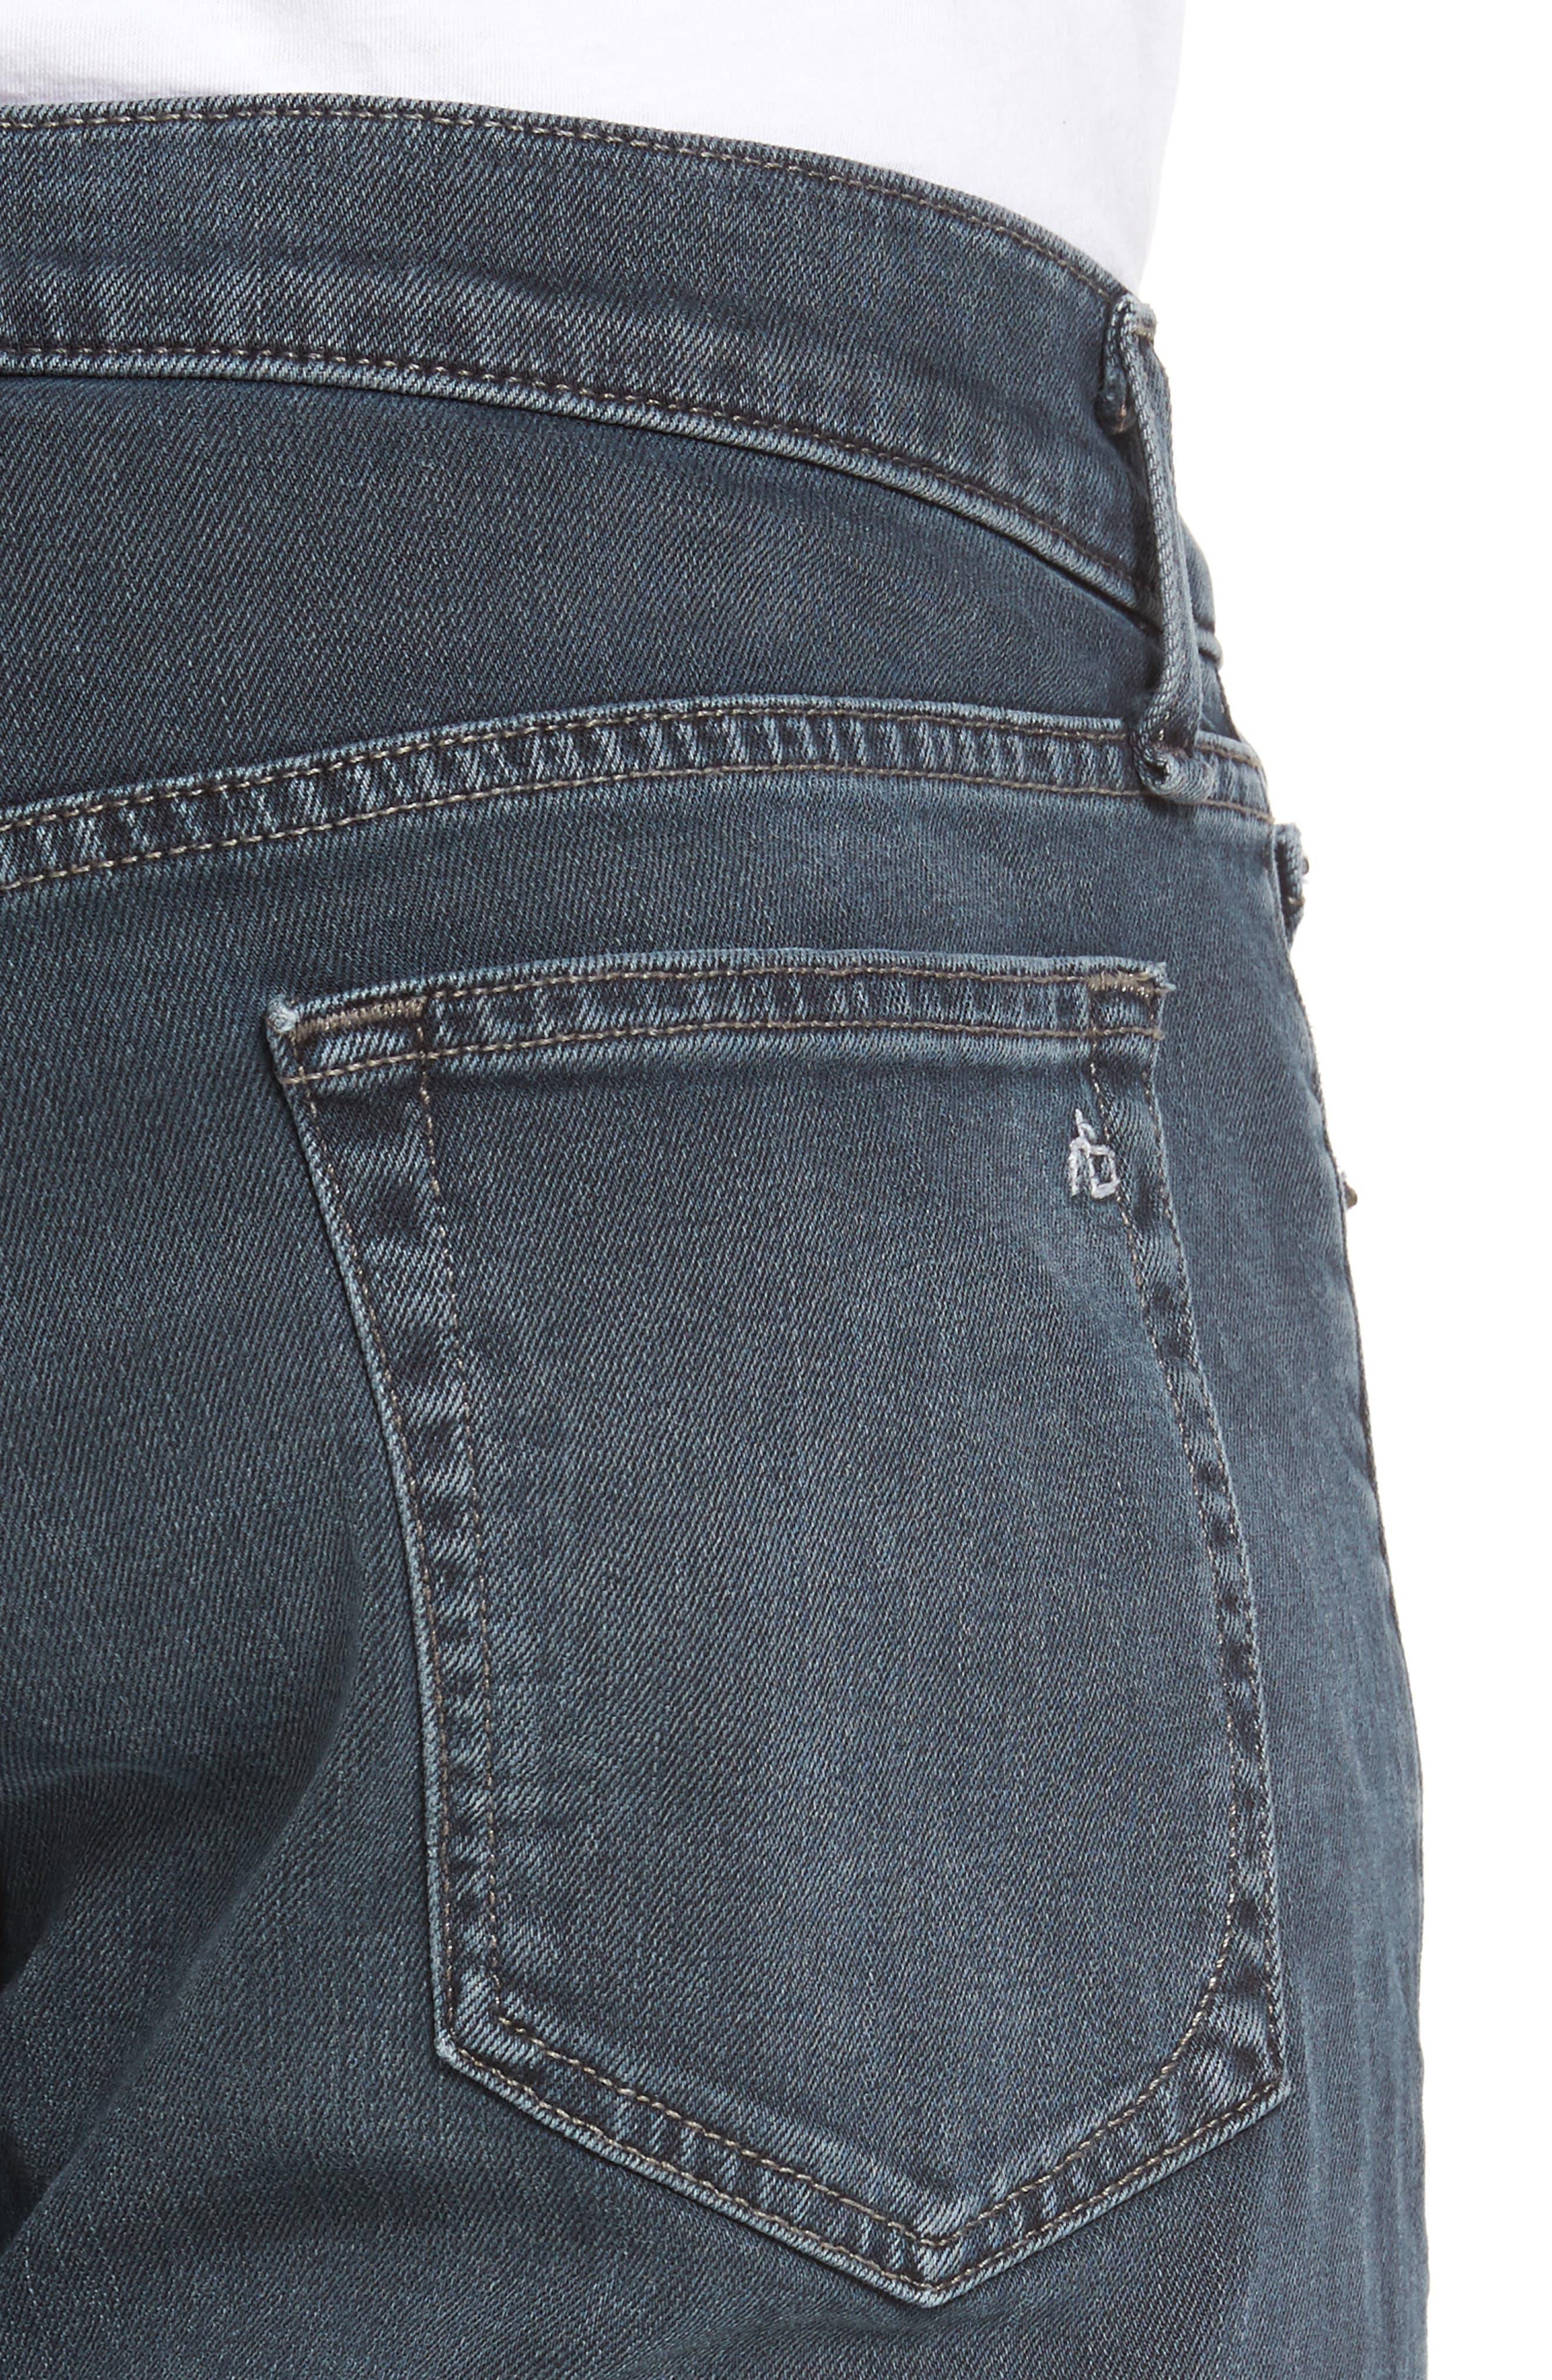 RAG & BONE, Fit 2 Slim Fit Jeans, Alternate thumbnail 5, color, MINNA